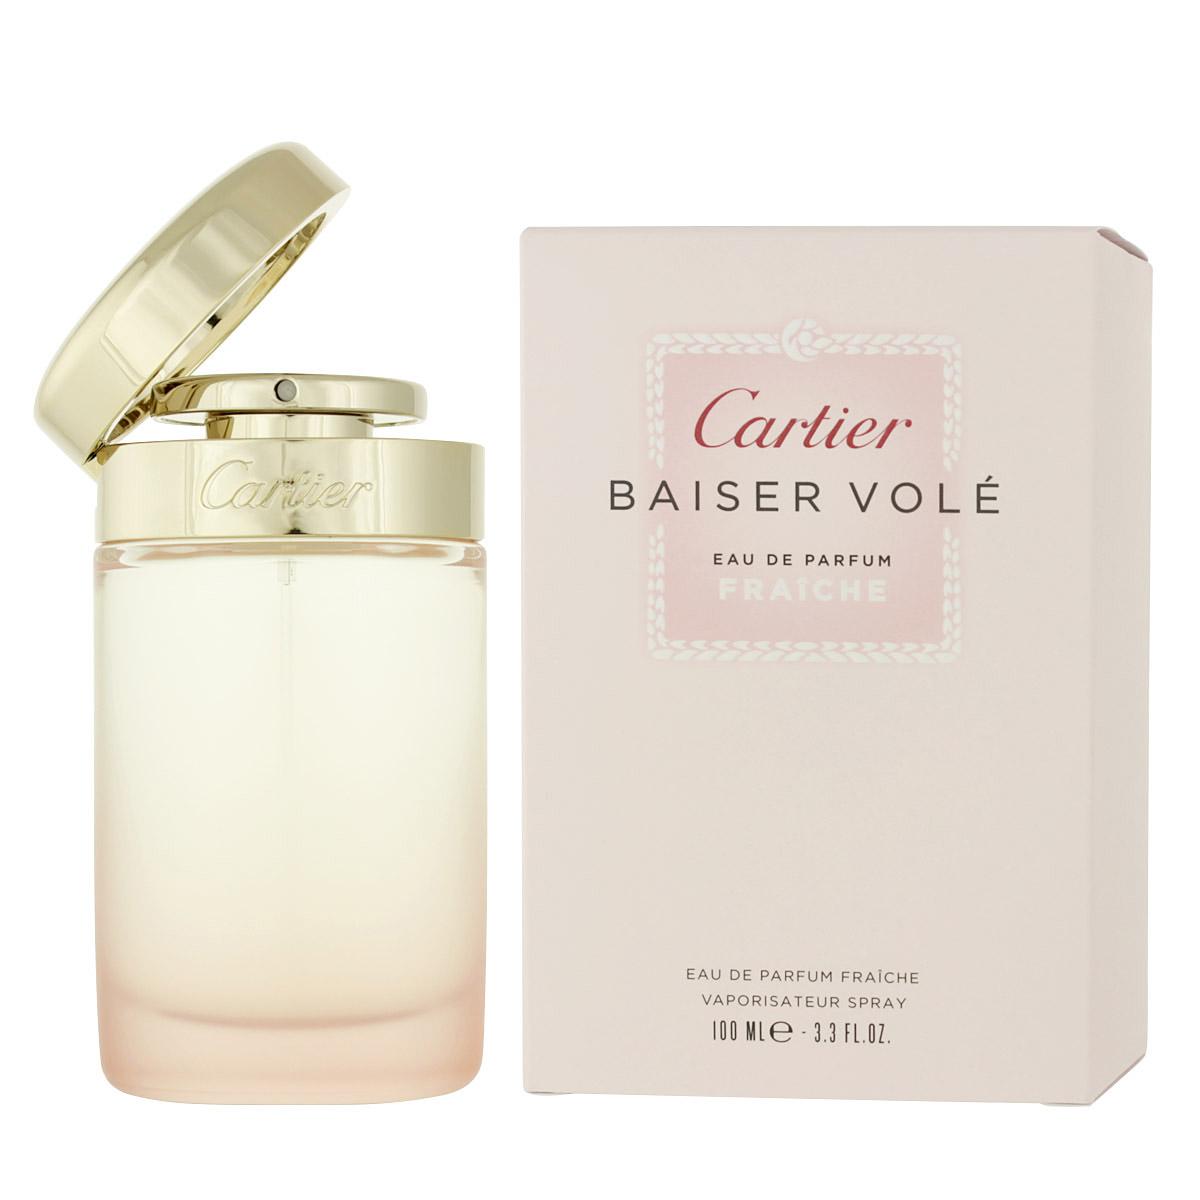 Cartier Baiser Volé EDP Fraîche 100 ml W